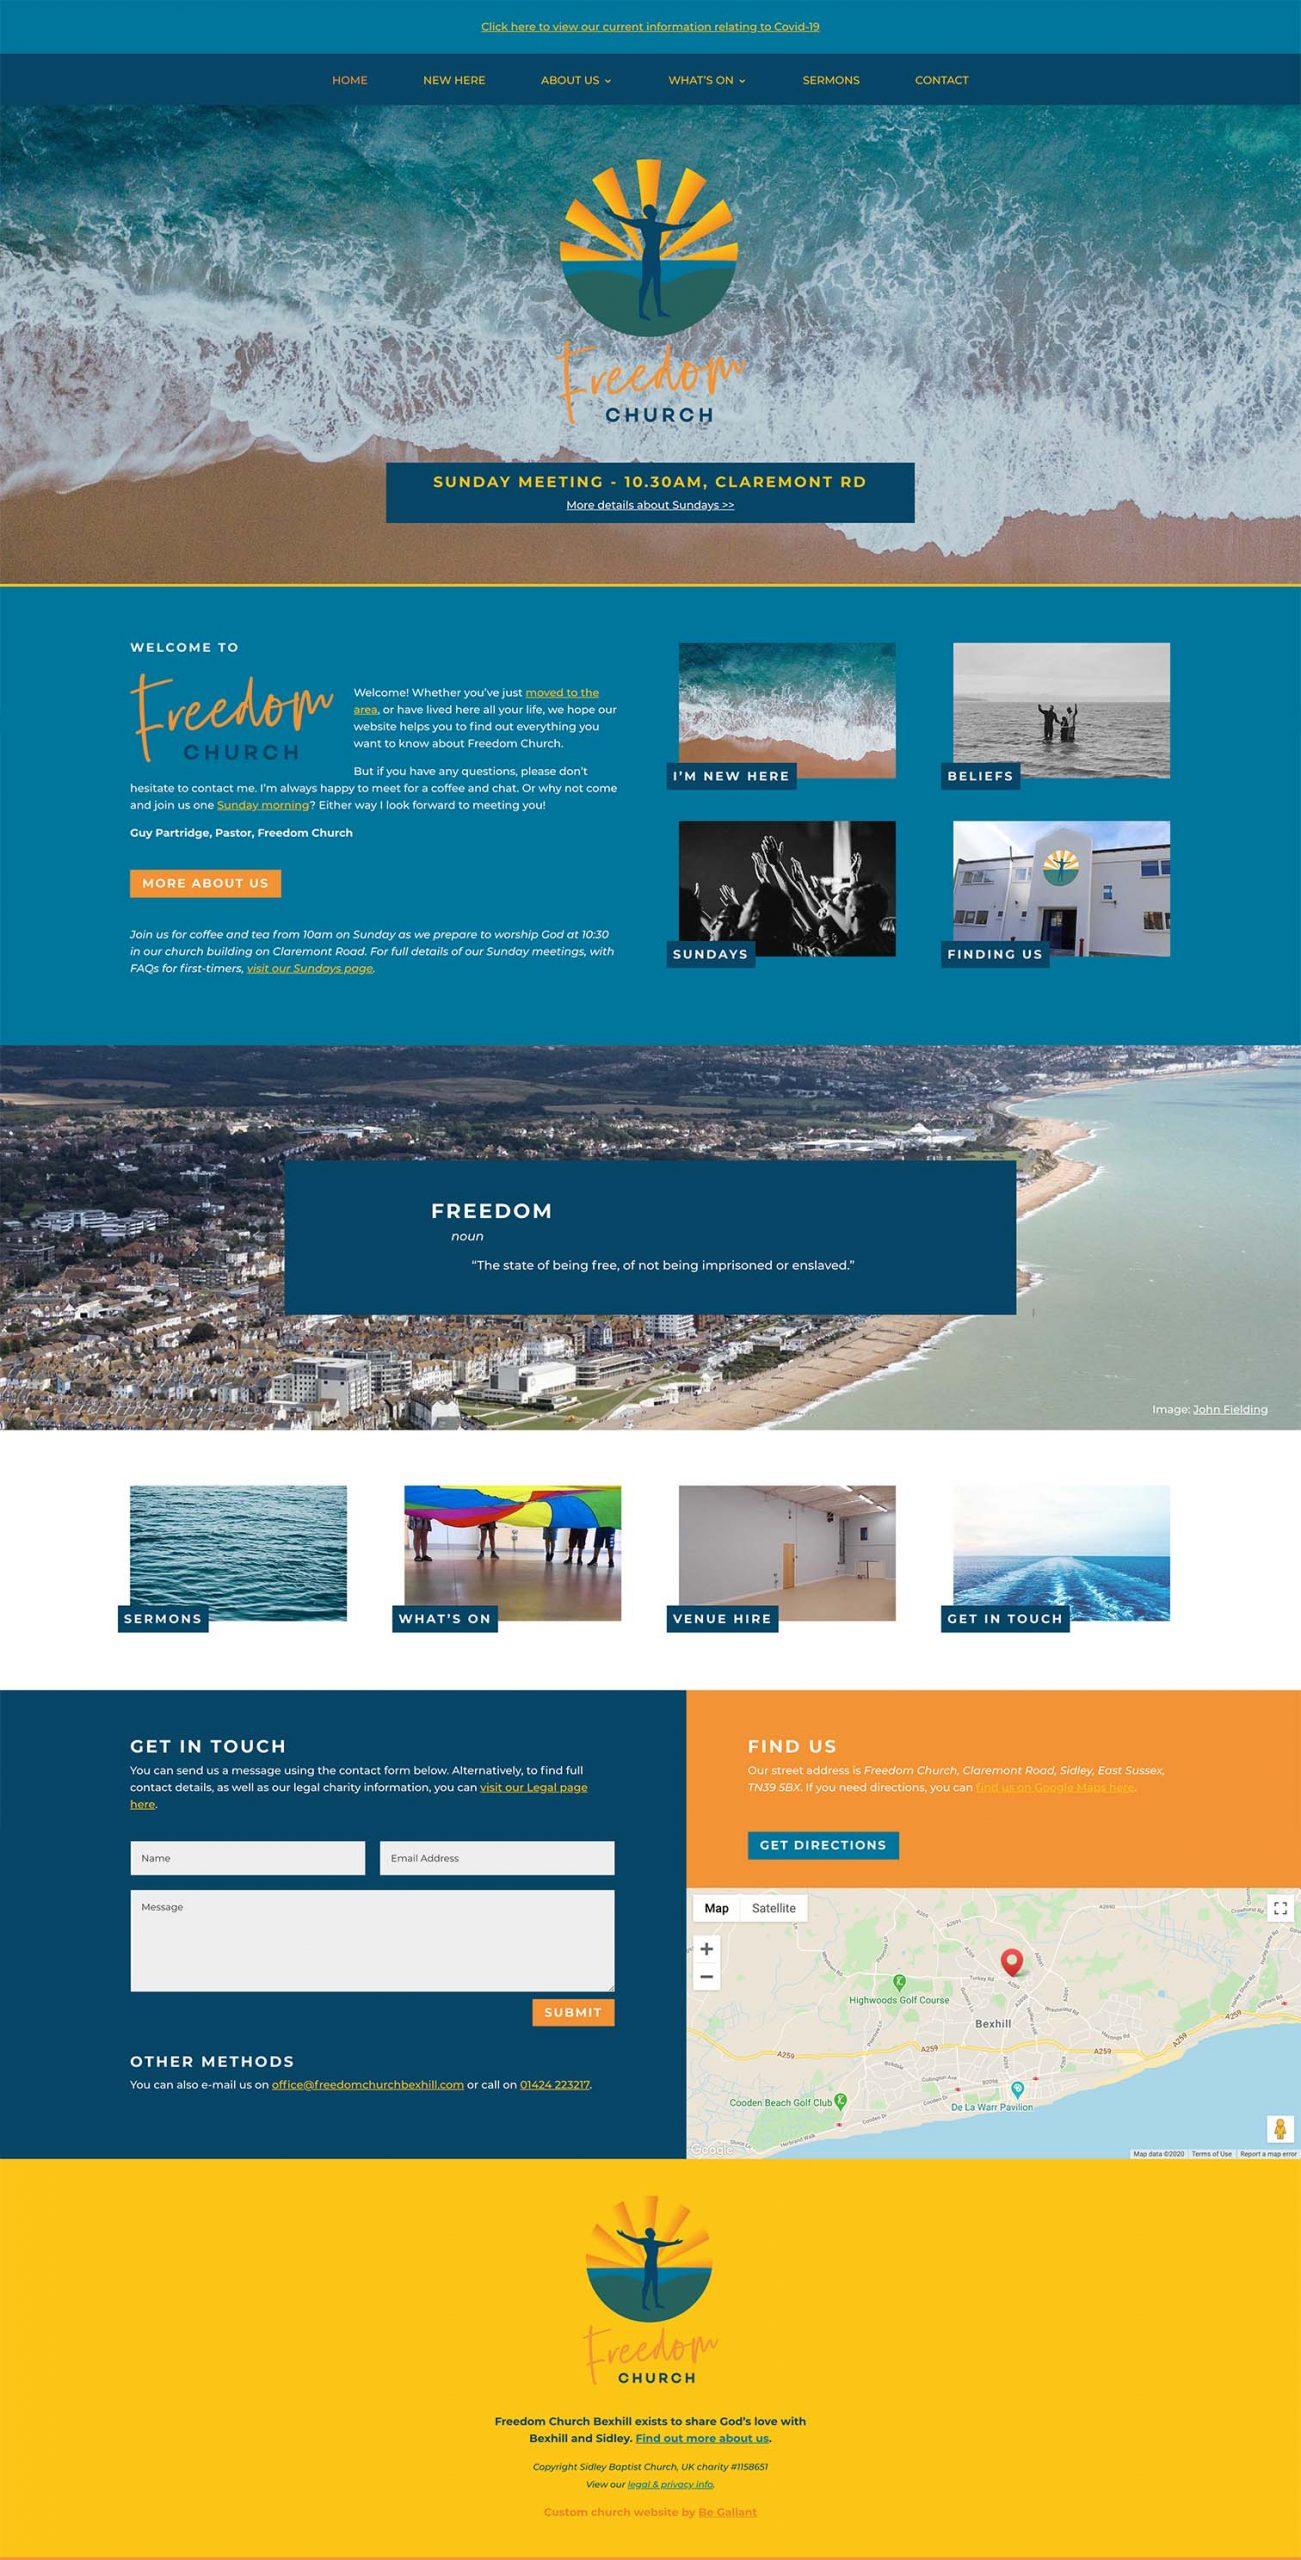 Freedom Church Bexhill - new church website design by Joe Gallant